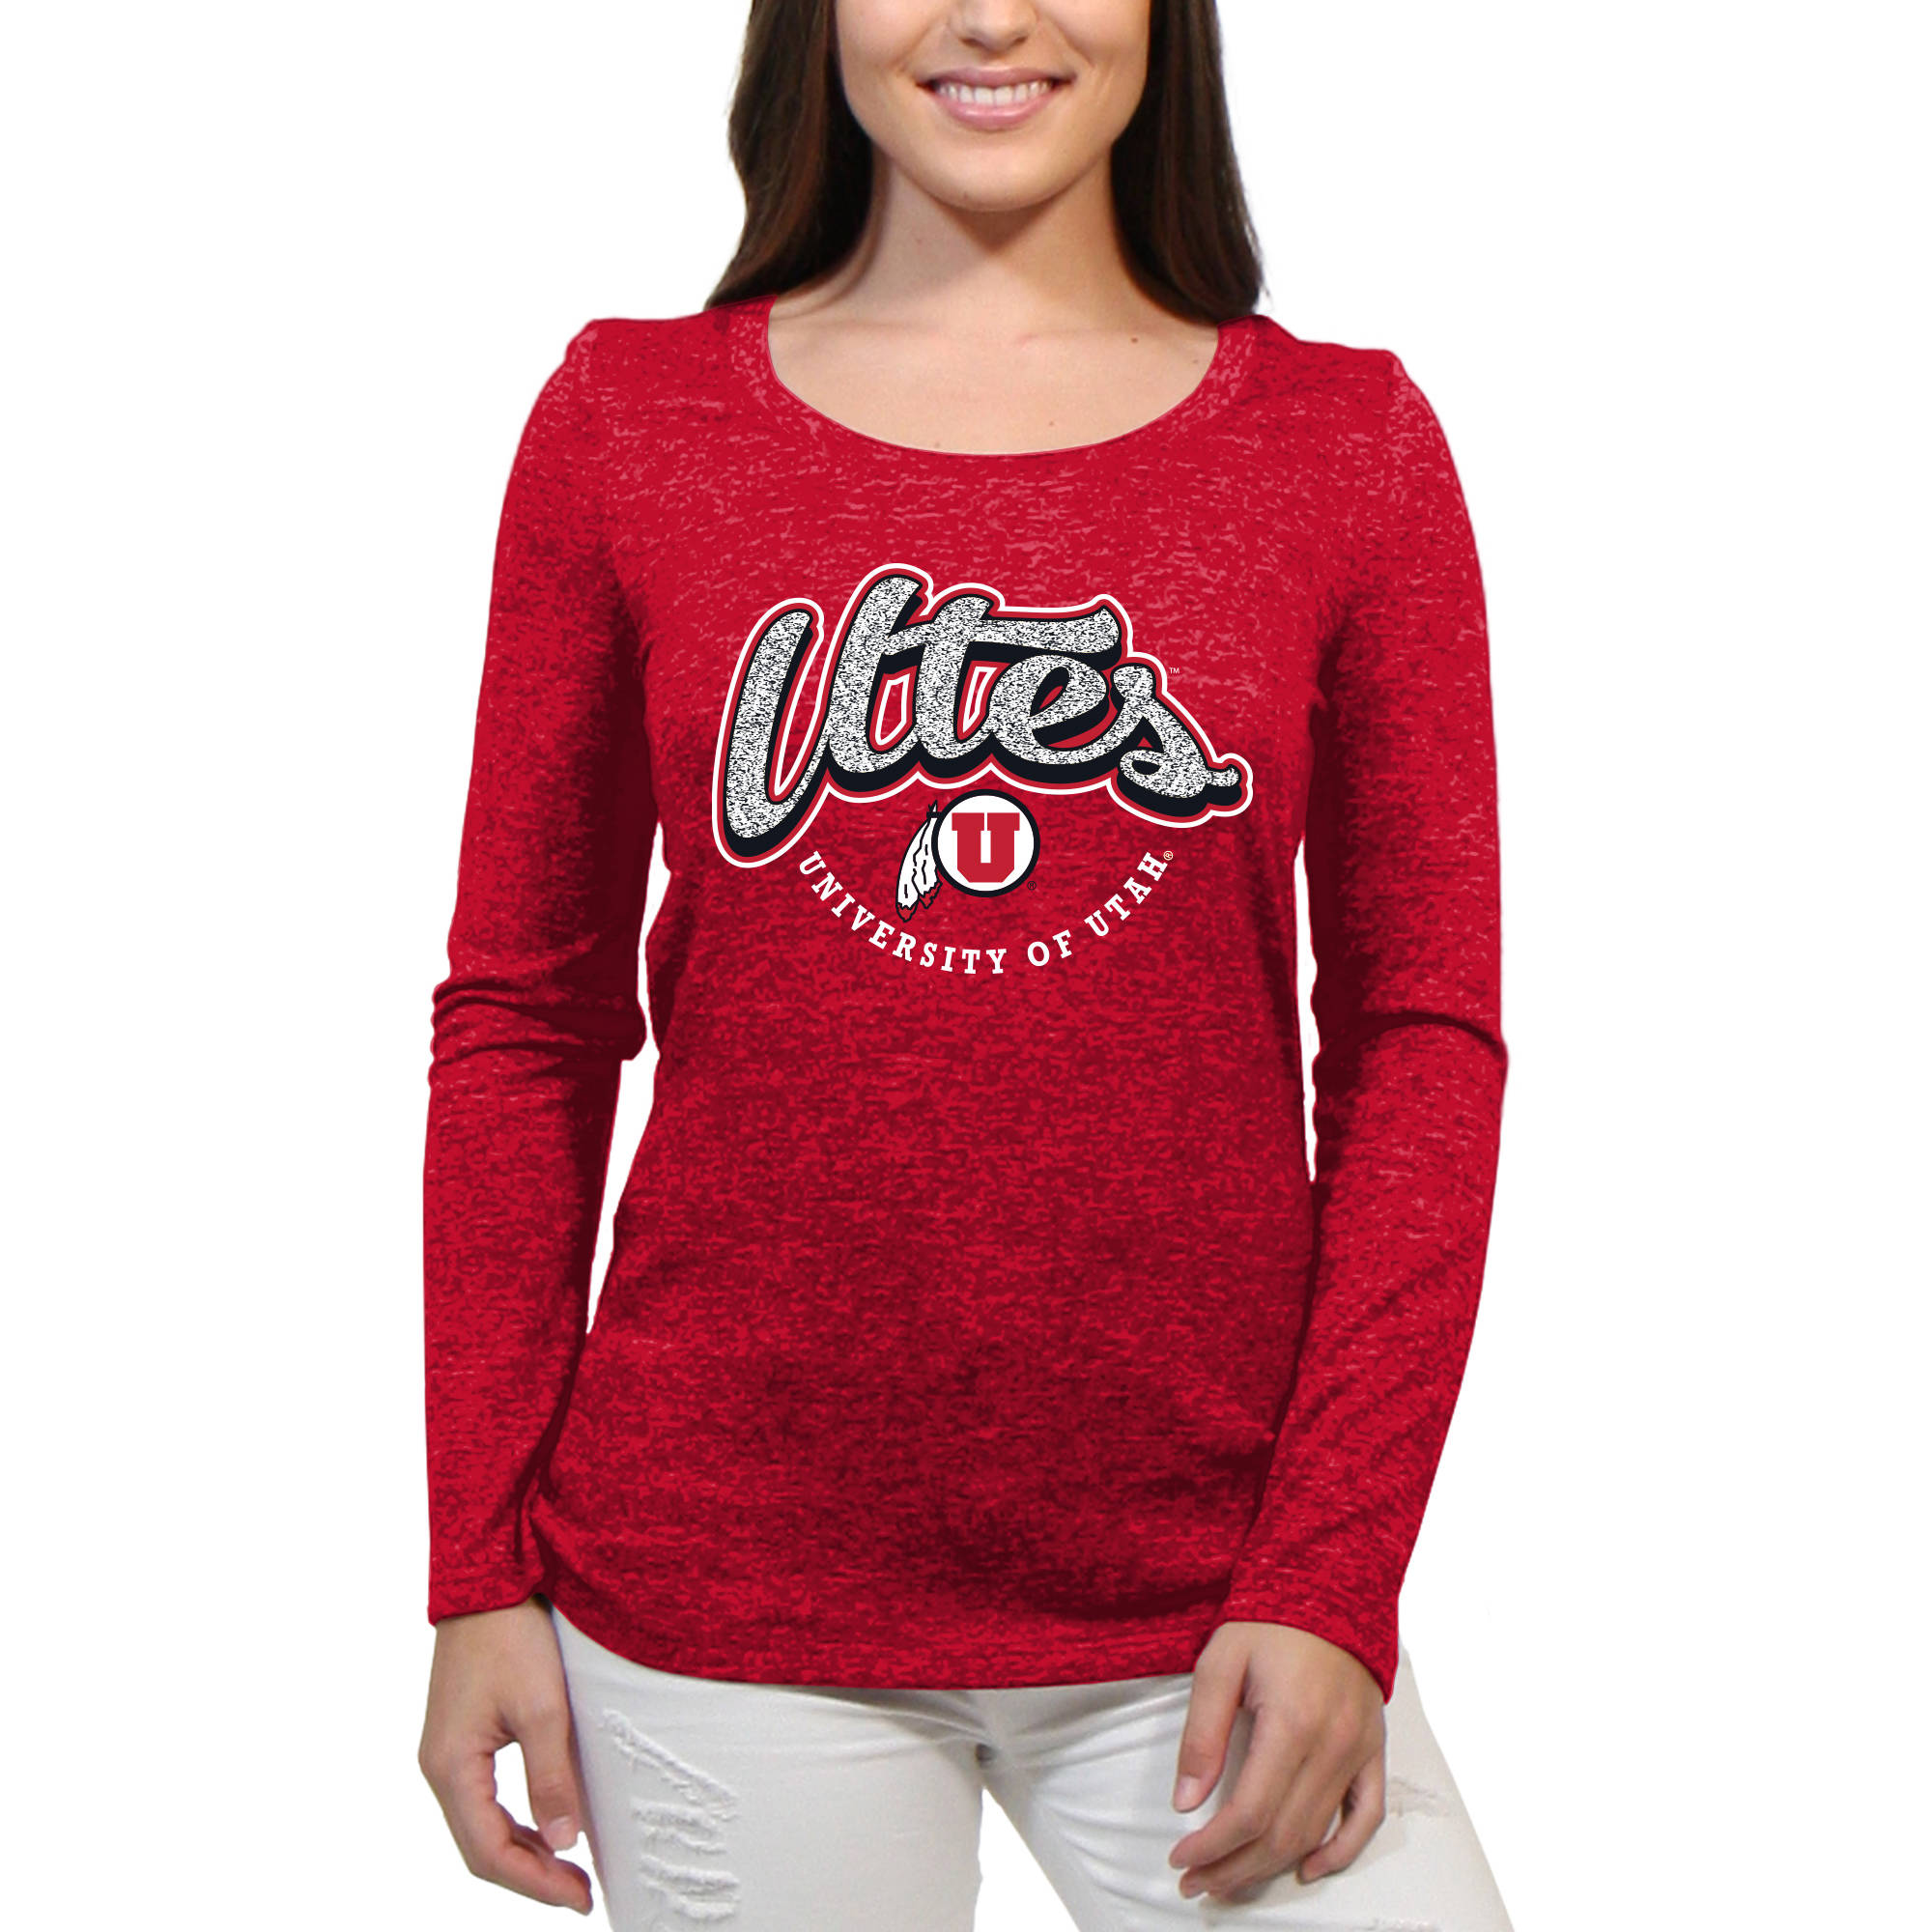 Utah Utes Funky Script Women'S/Juniors Team Long Sleeve Scoop Neck Shirt